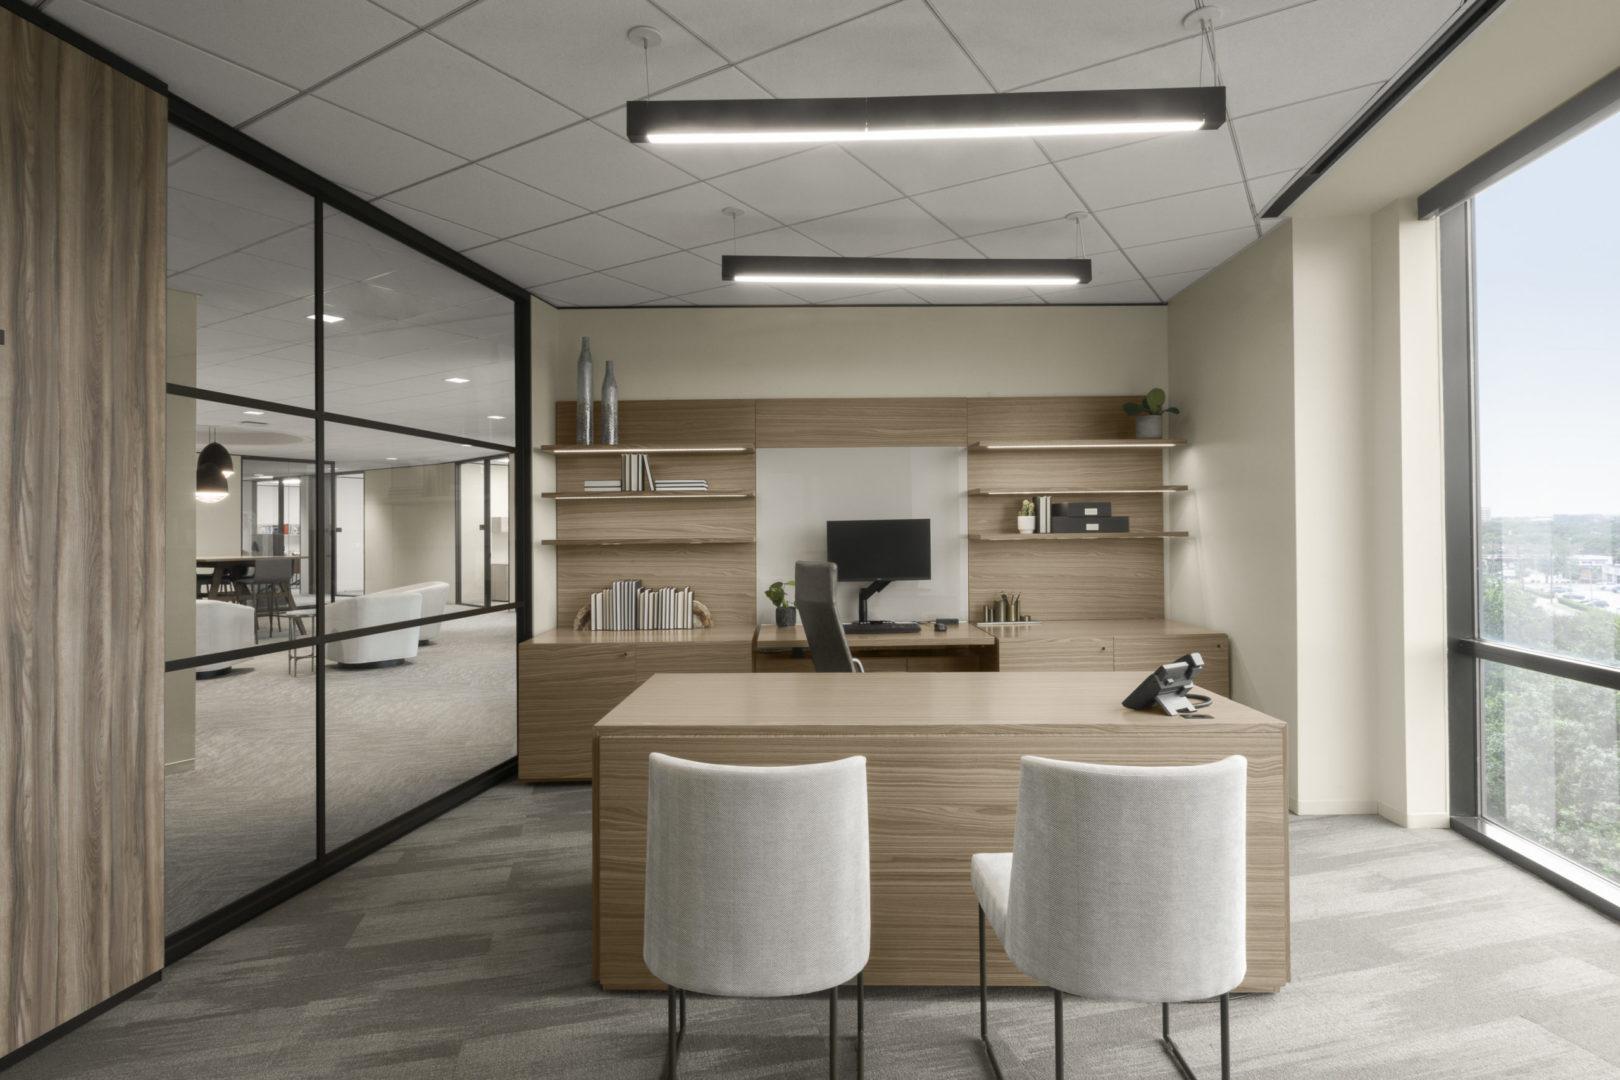 Encino Energy_Corporate Executive Office Design